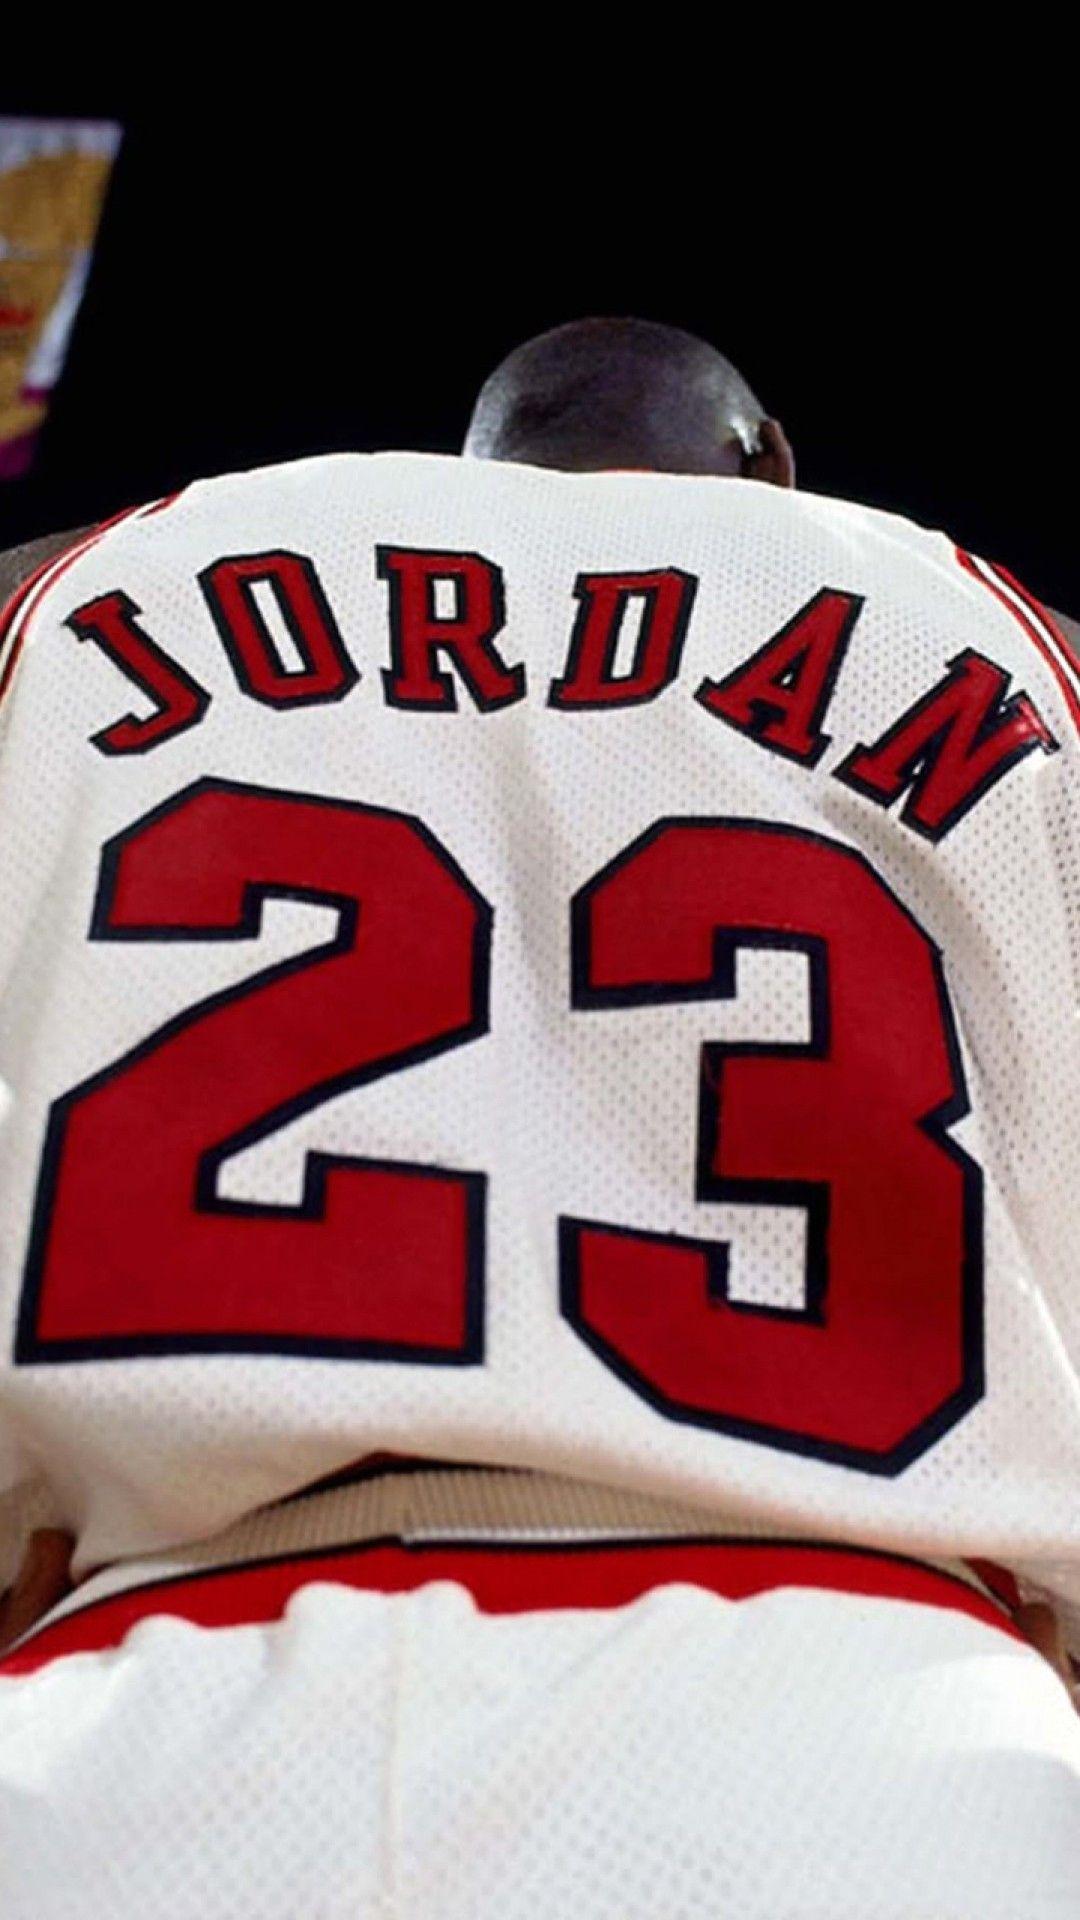 Michael Jordan Michael Jordan Wallpaper Iphone Iphone Wallpaper Jordan Michael Jordan